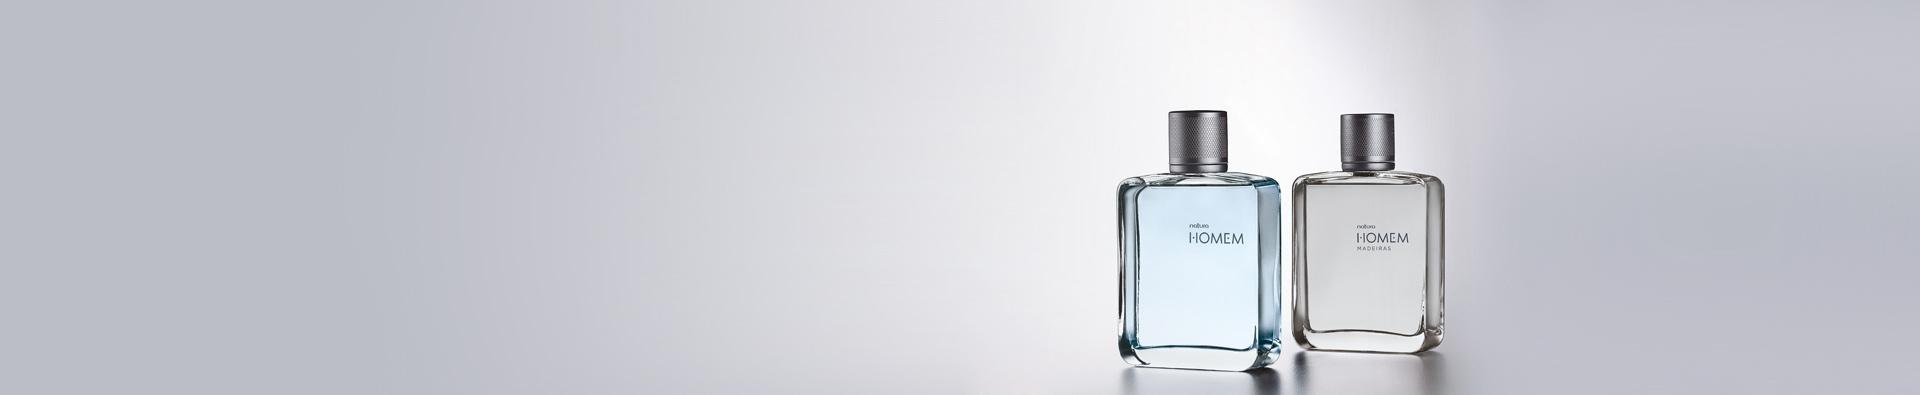 Dos perfumes Natura Homem